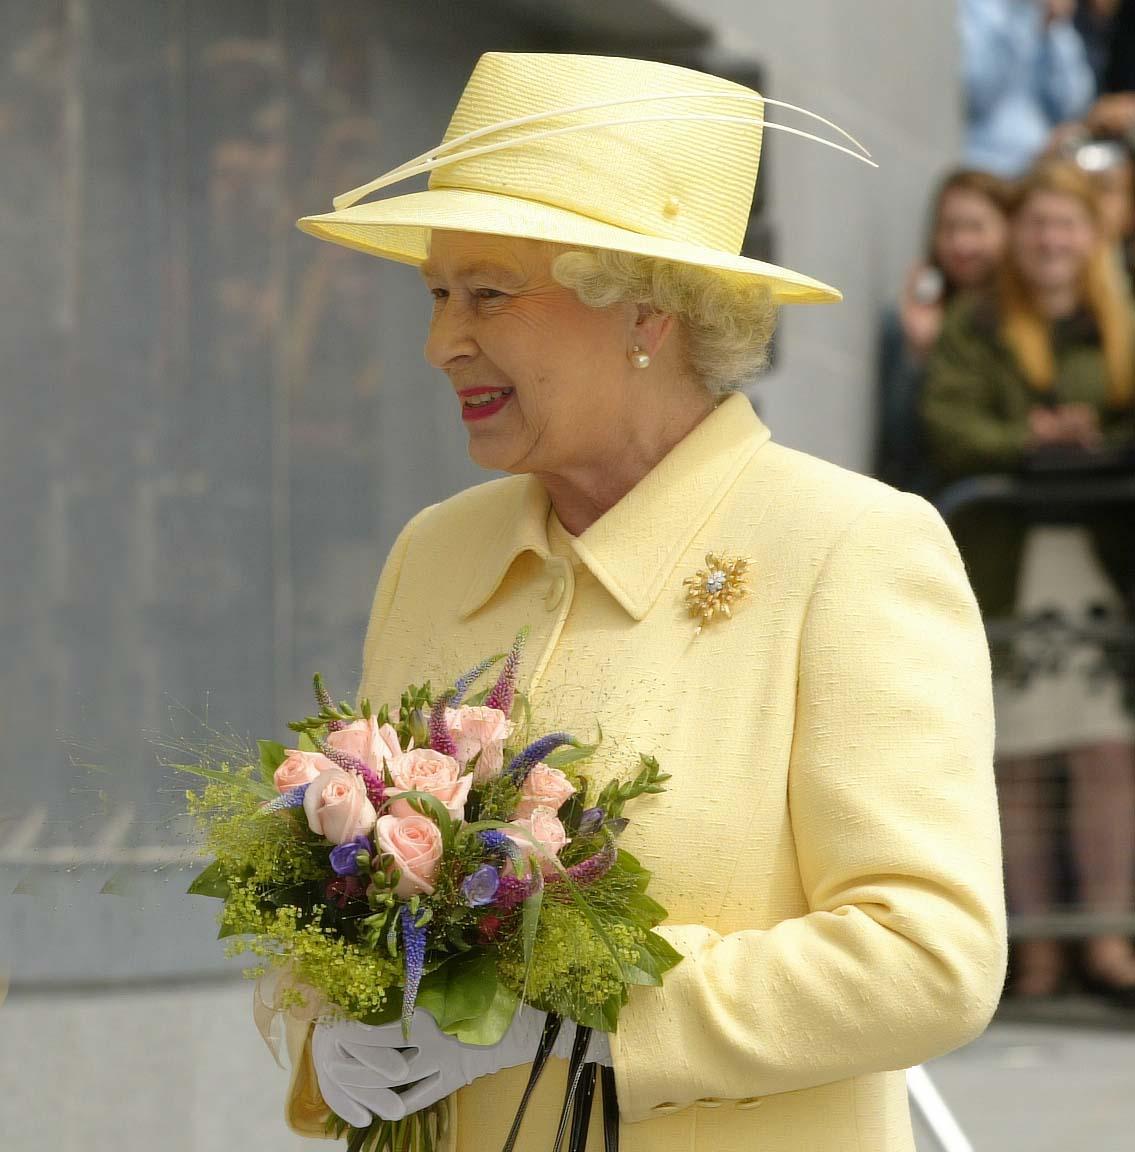 'Bomb' found in Ireland ahead of Queen Visit